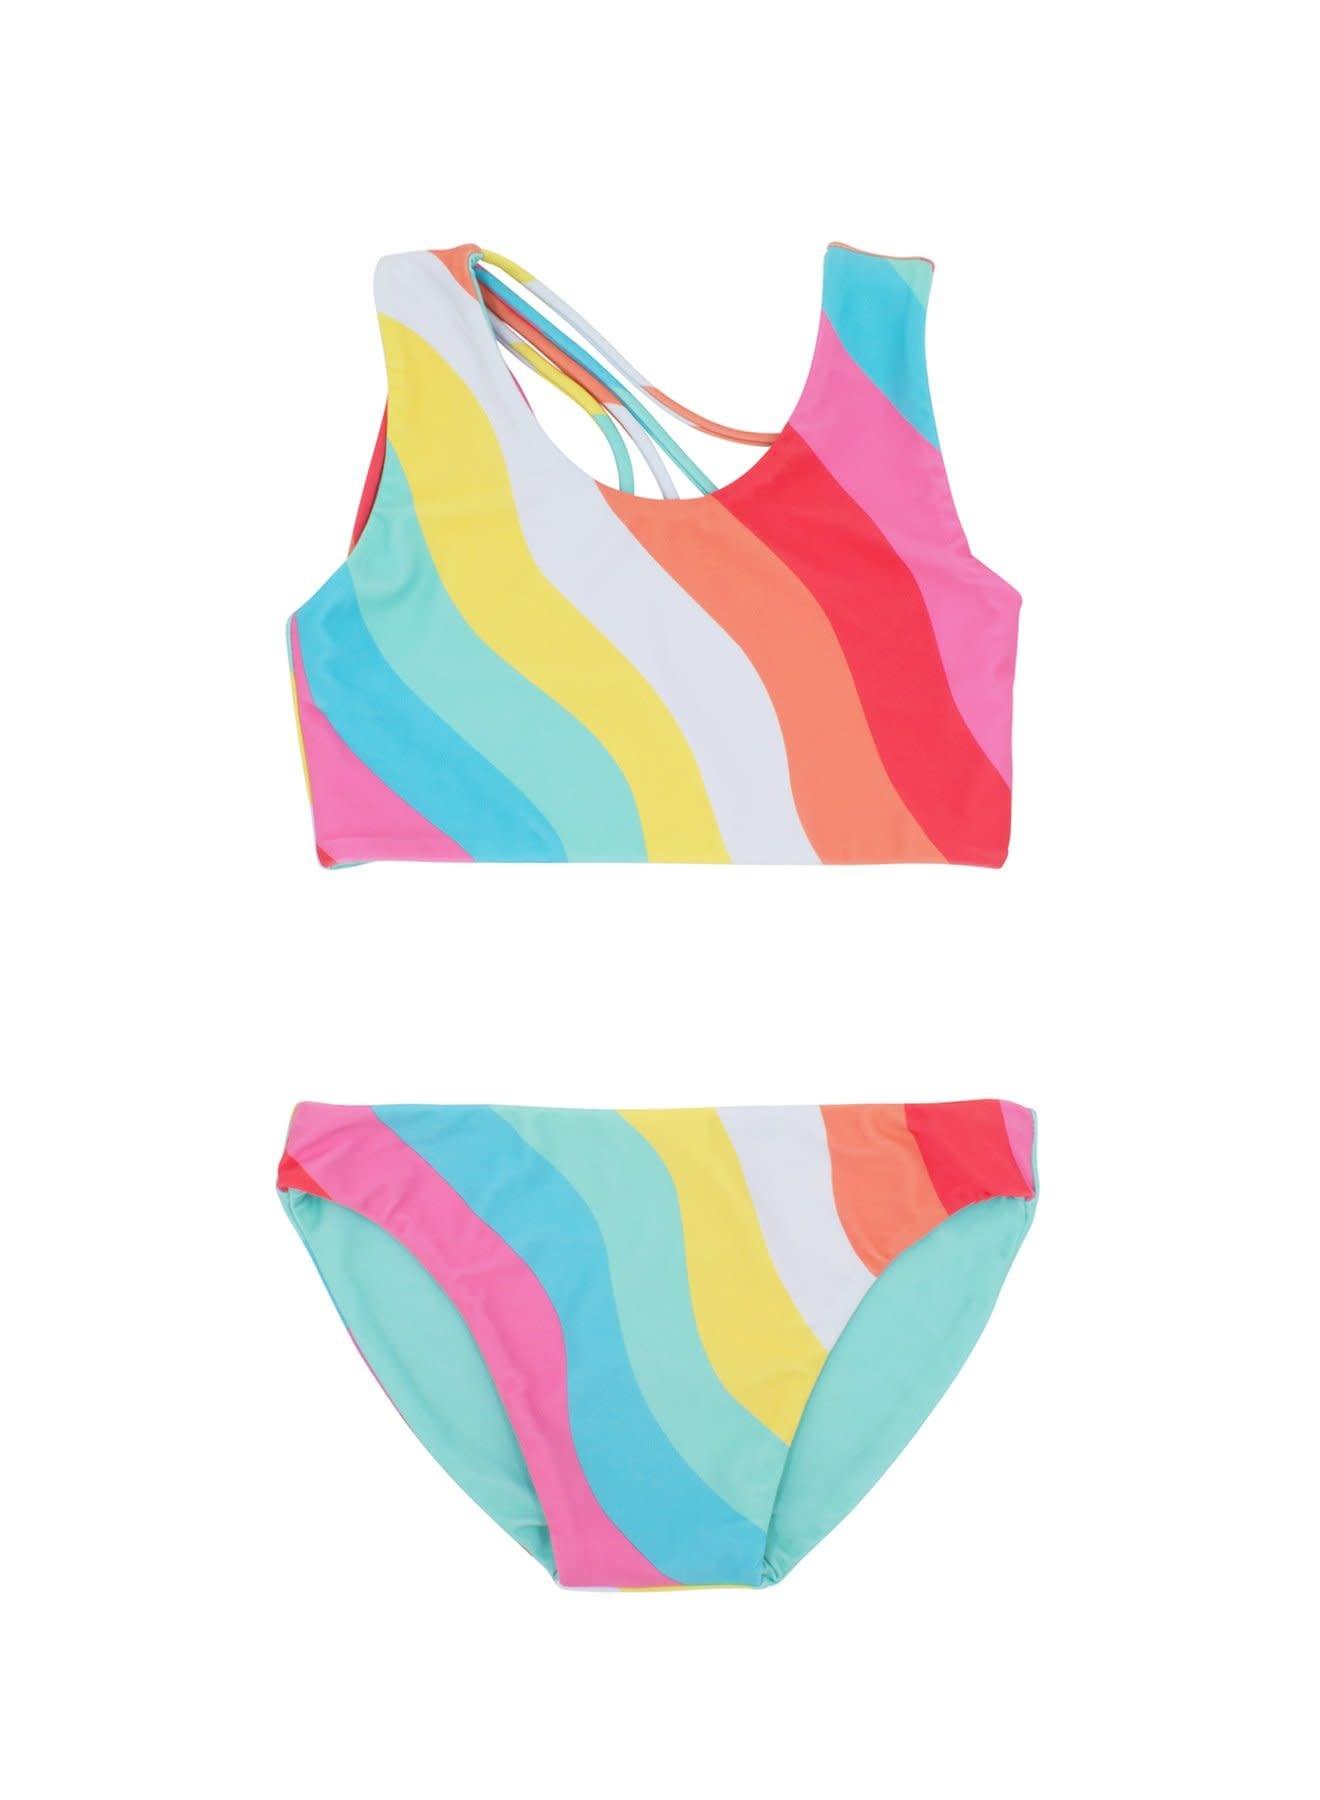 Feather 4 Arrow Tropical Reversible Bikini